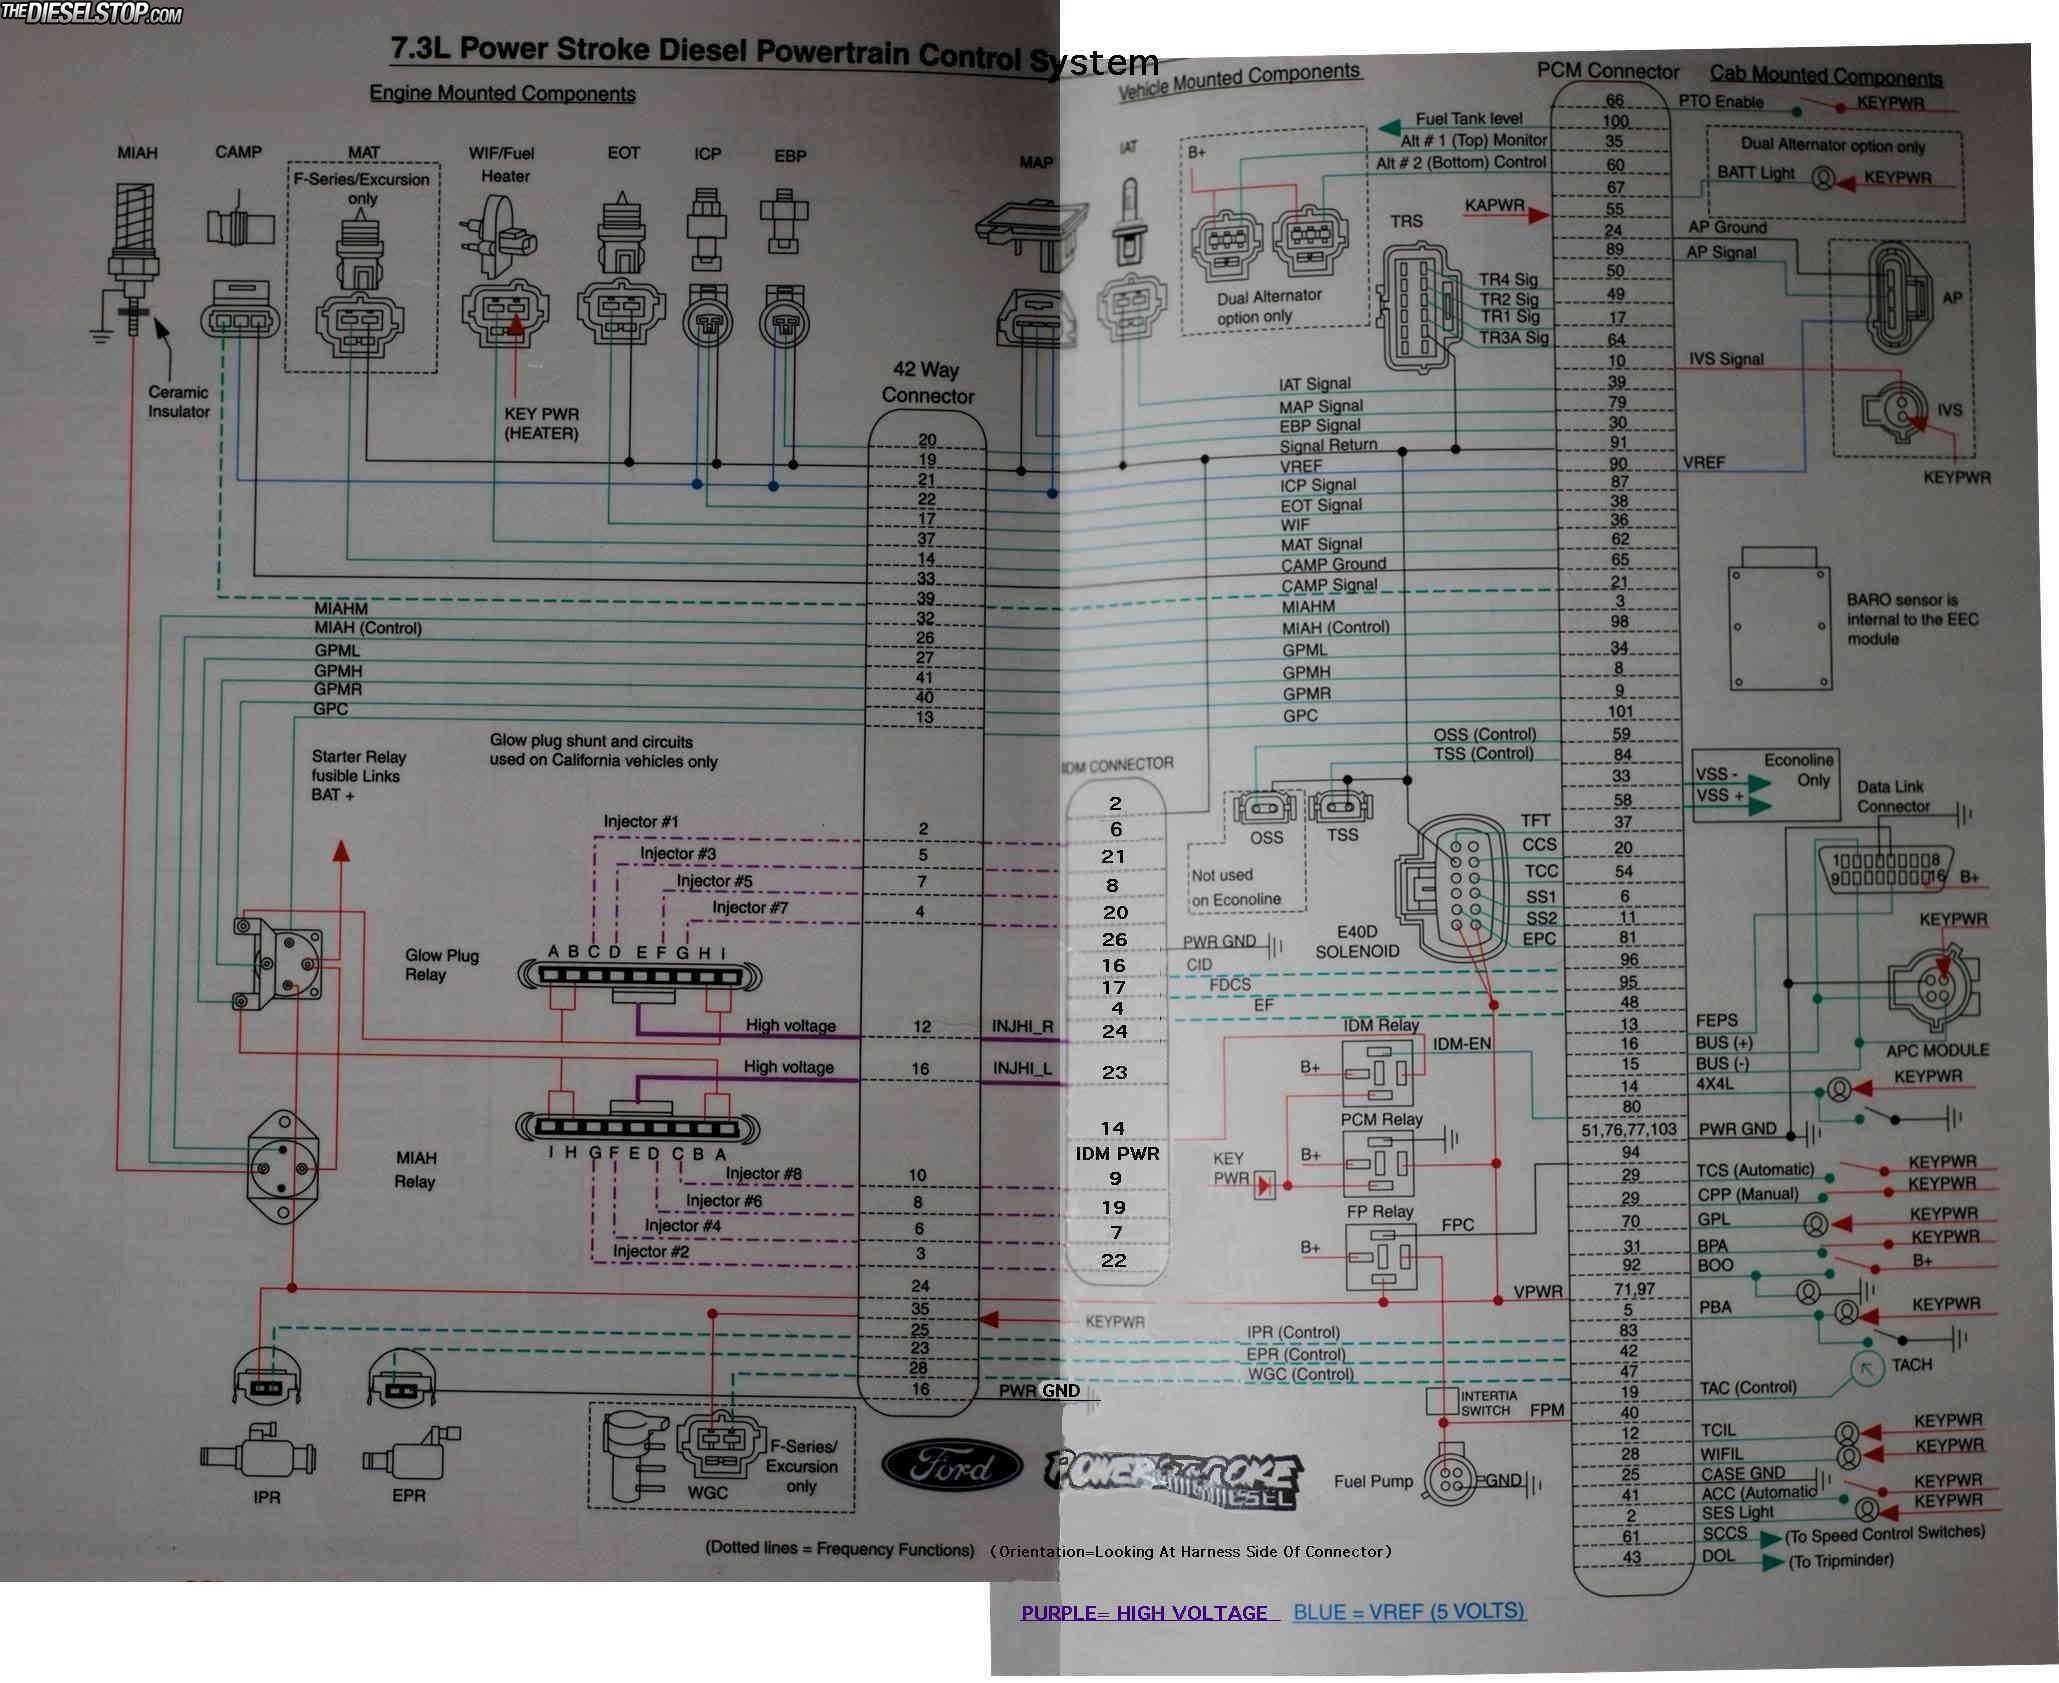 4 6 Liter ford Engine Diagram   My Wiring DIagram  Liter Engine Diagram on